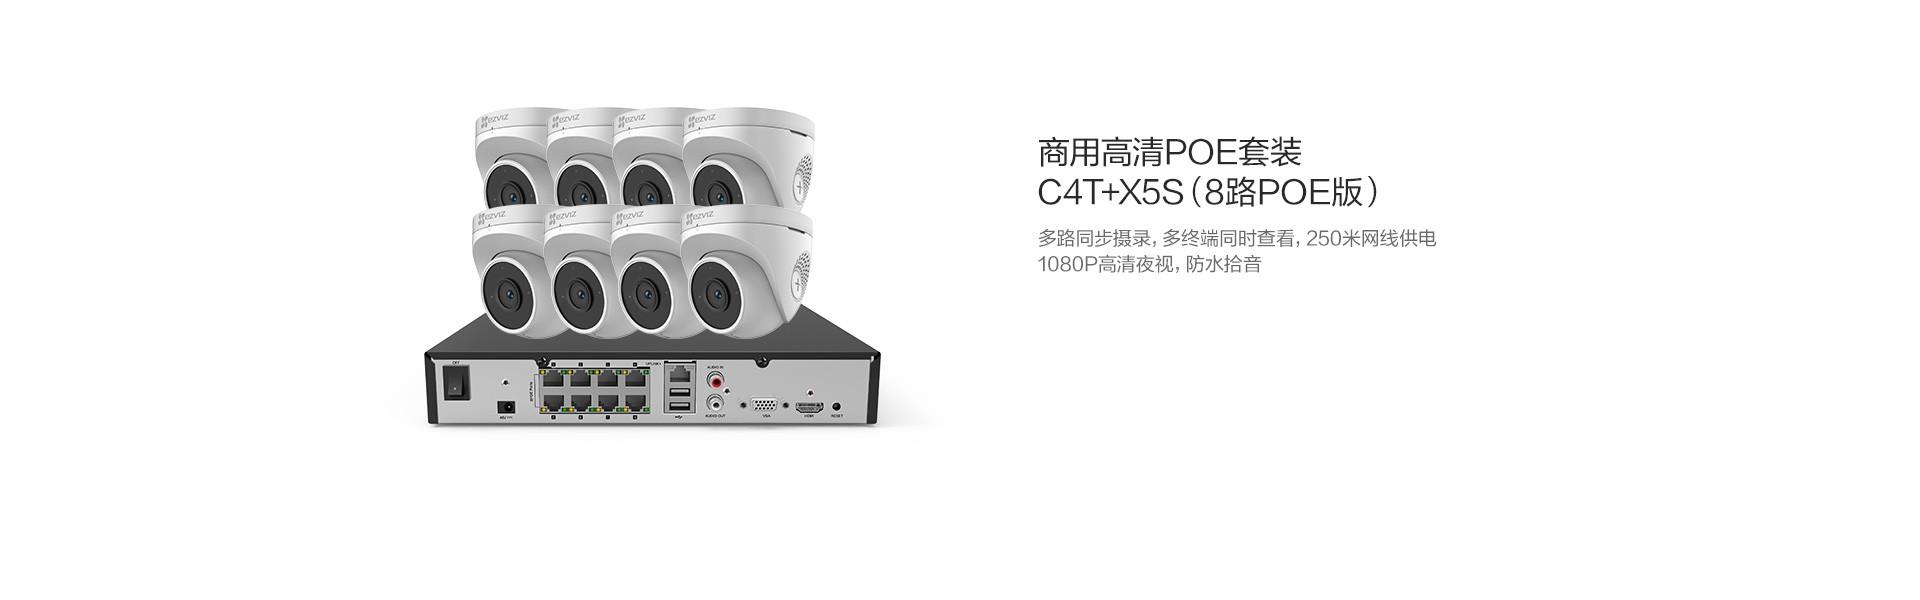 C4T+X5S-PC头图(3).jpg